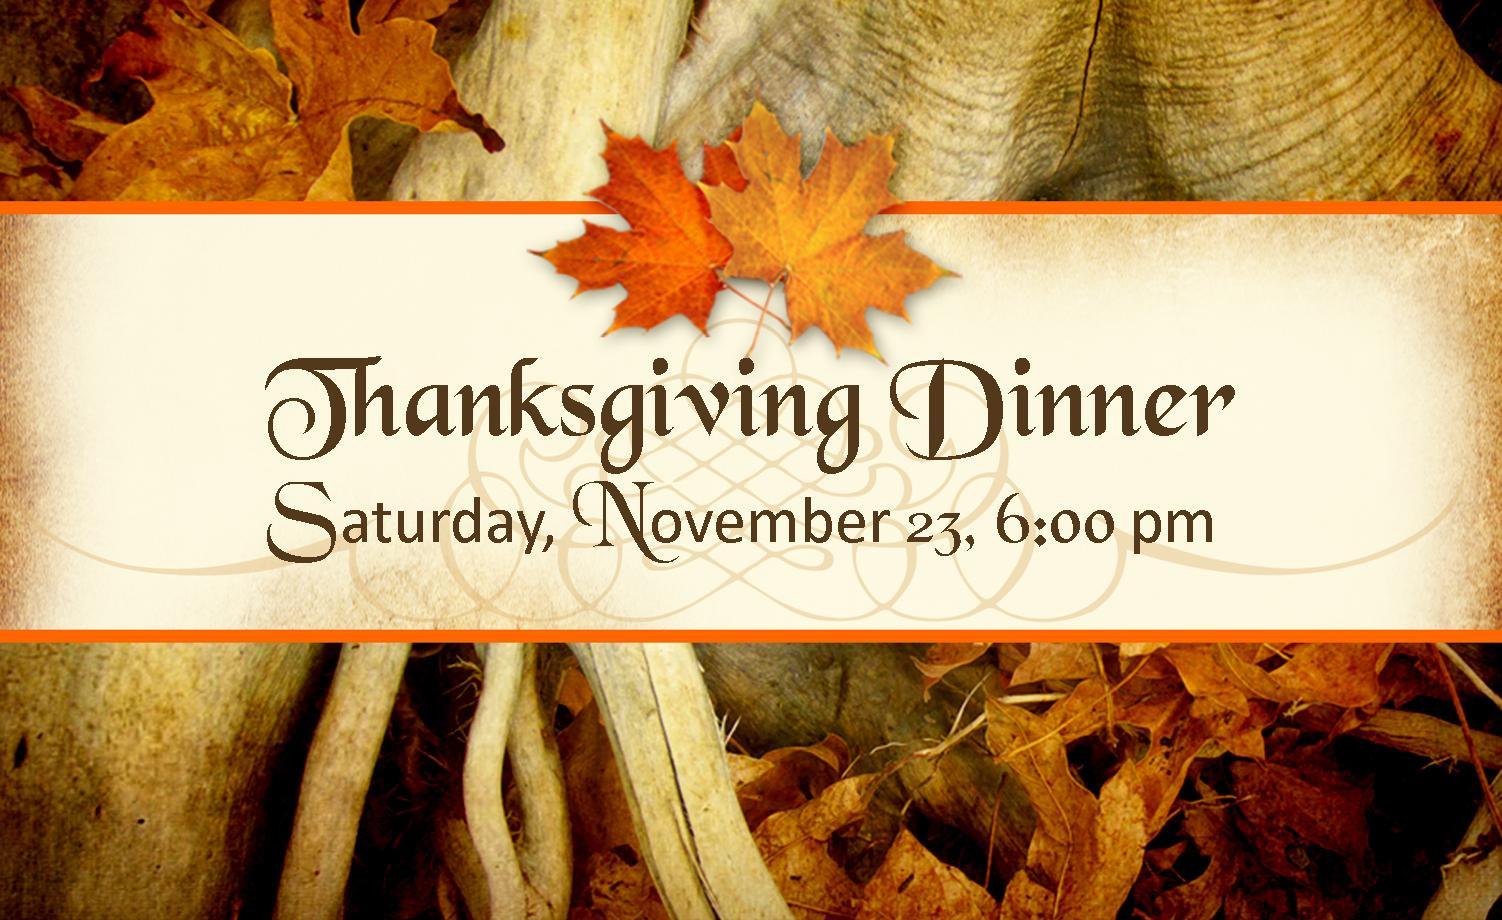 Church Thanksgiving Dinner  Church Thanksgiving Dinner Clipart – 101 Clip Art